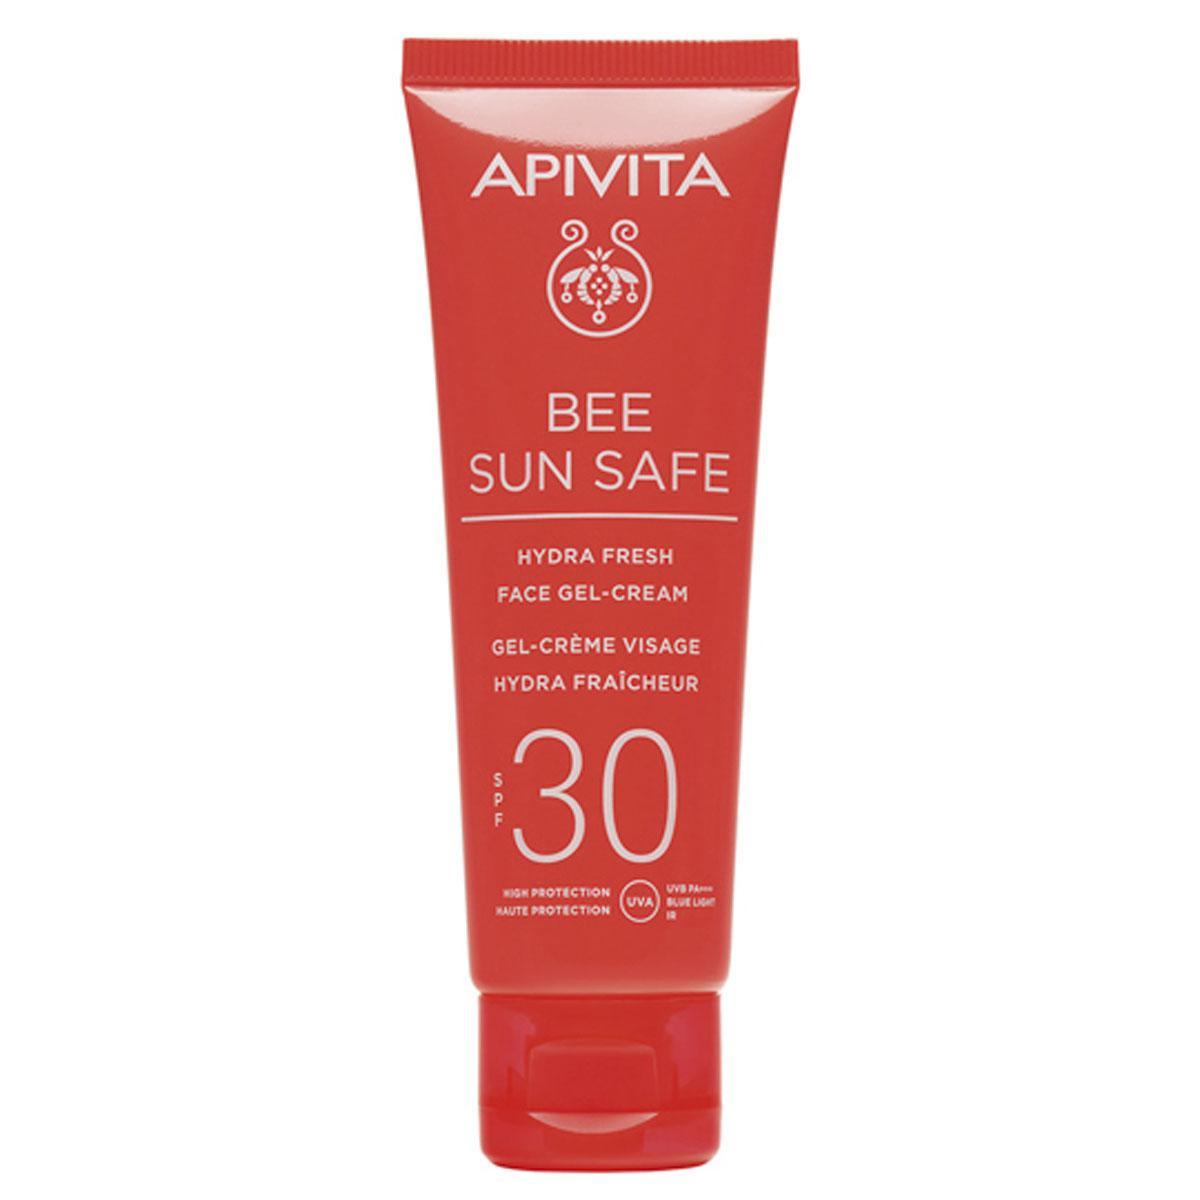 Bee Sun Safe Hydra Fresh Gel-Crème SPF30, Apivita, 17,30 euros, PACKSHOTS: SDP